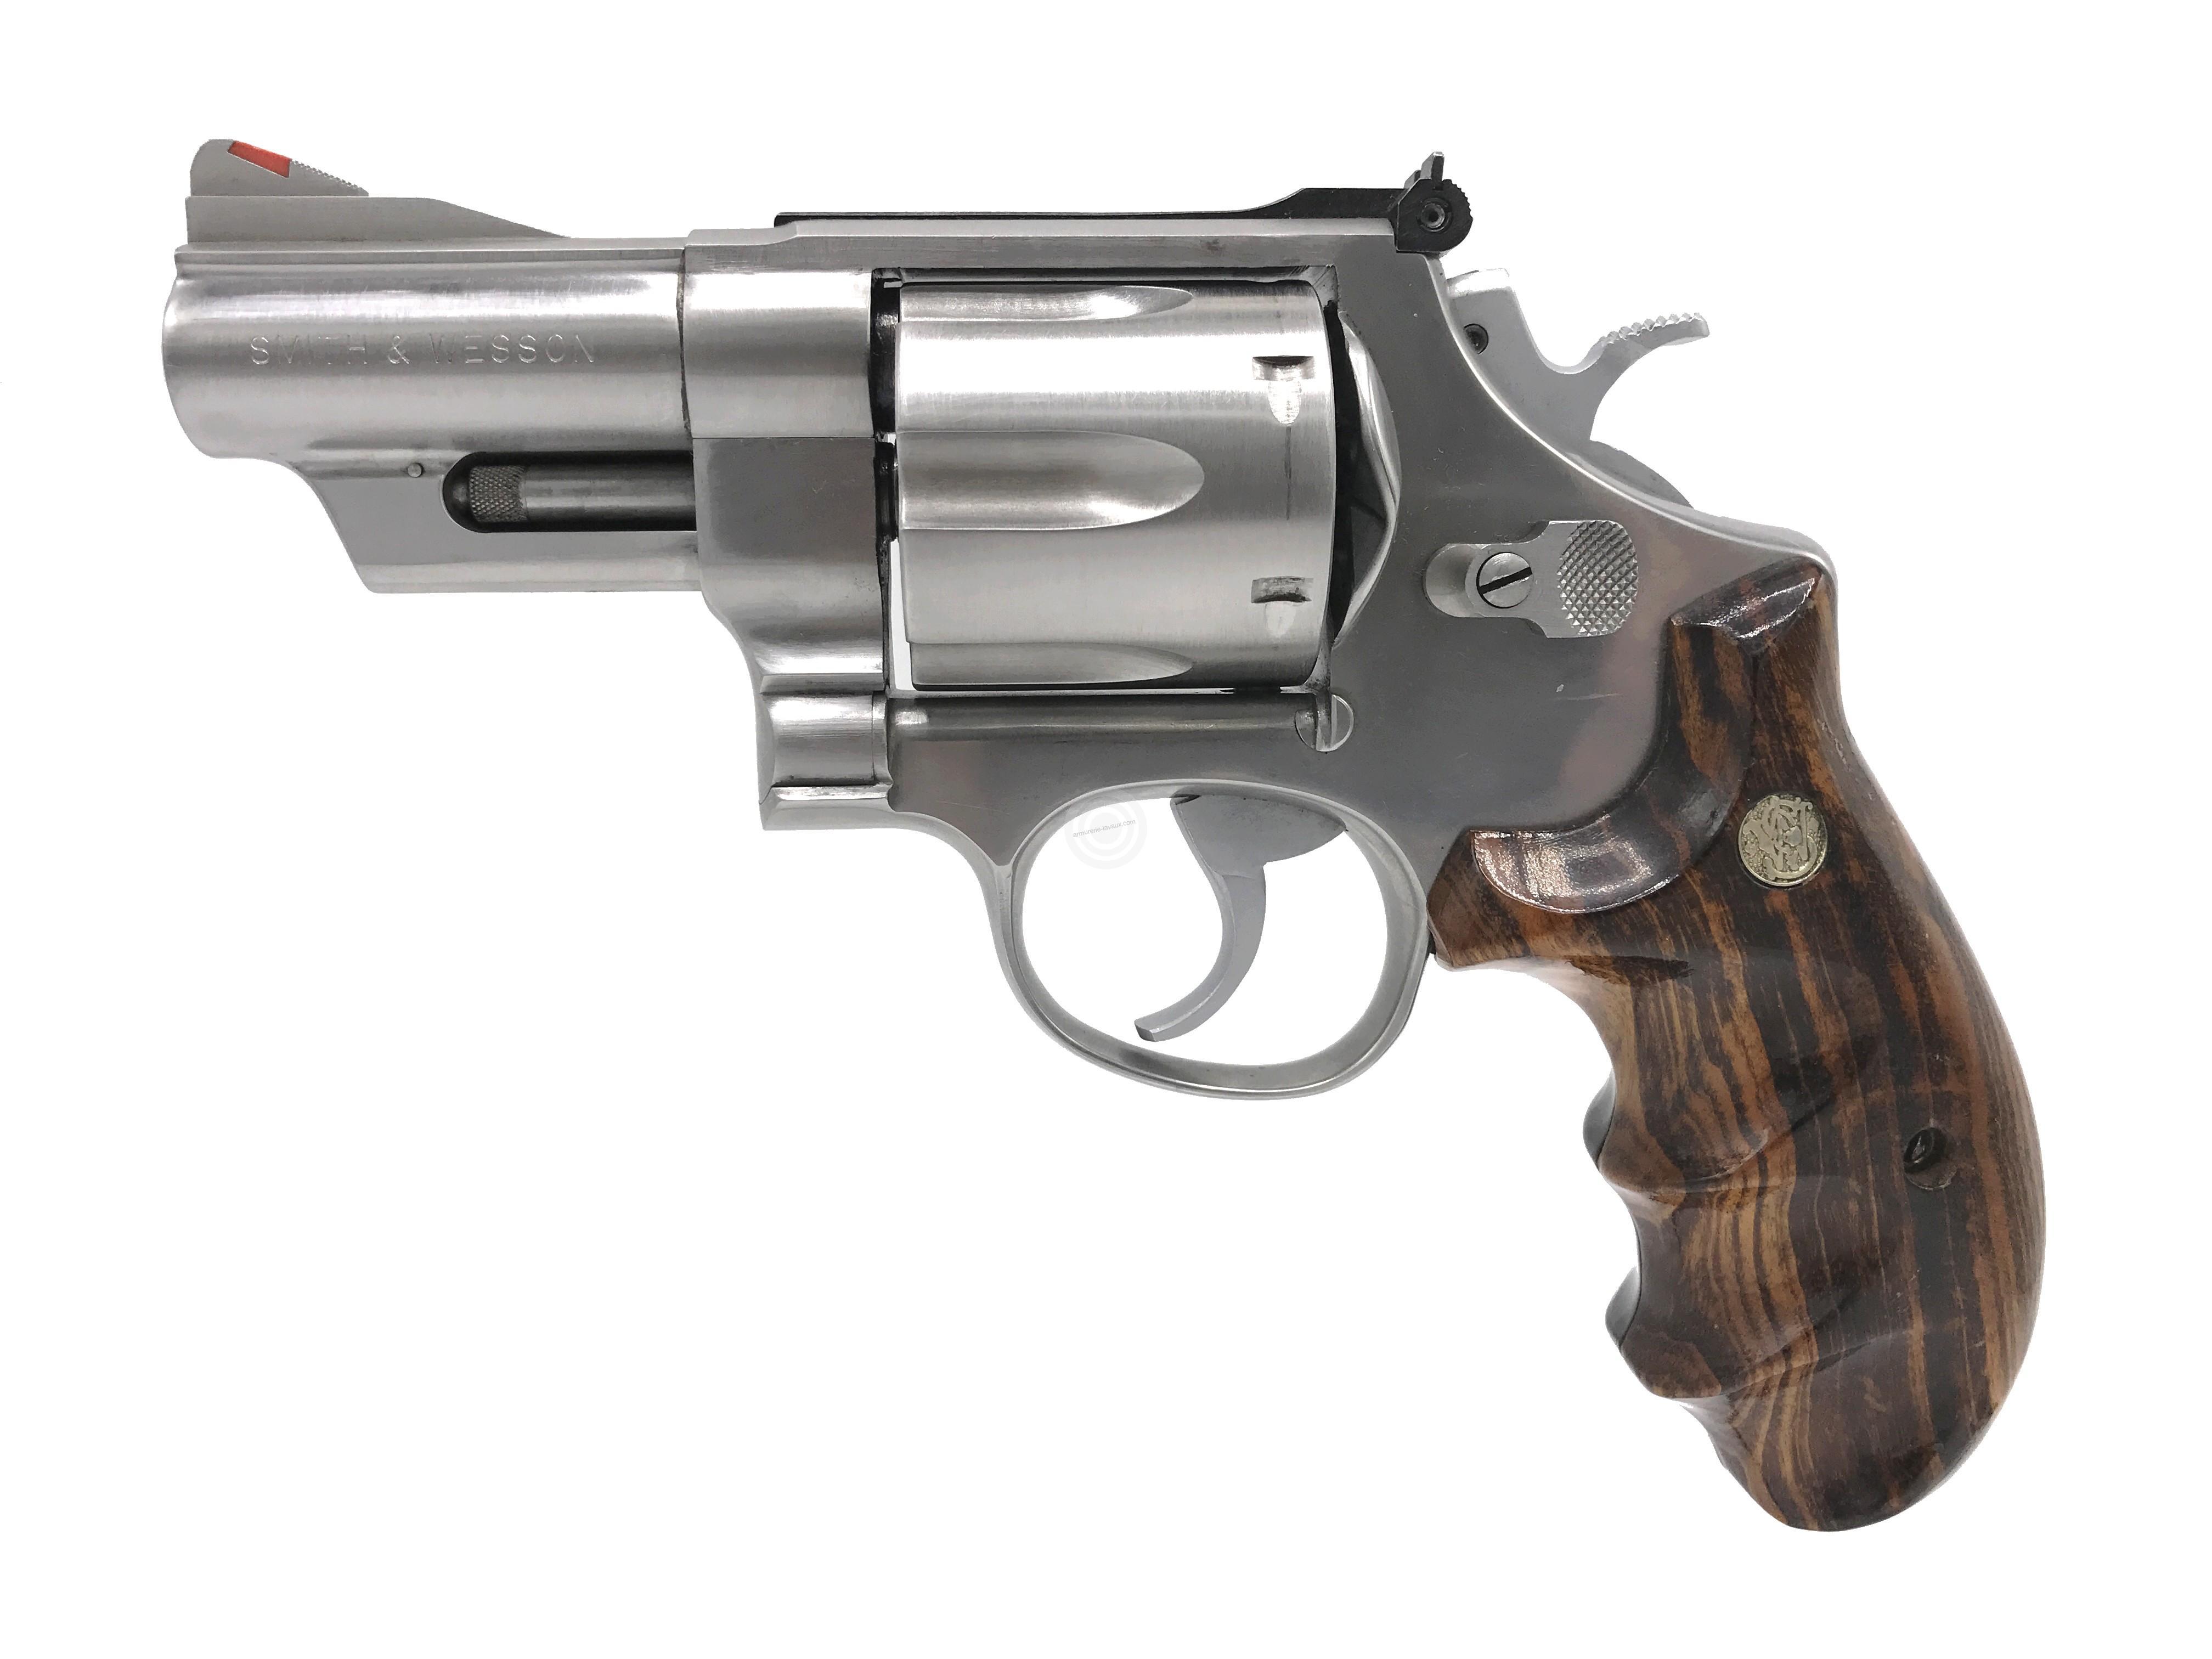 revolver smith wesson 629 2 magnum occasion armes cat gorie b sur armurerie lavaux. Black Bedroom Furniture Sets. Home Design Ideas